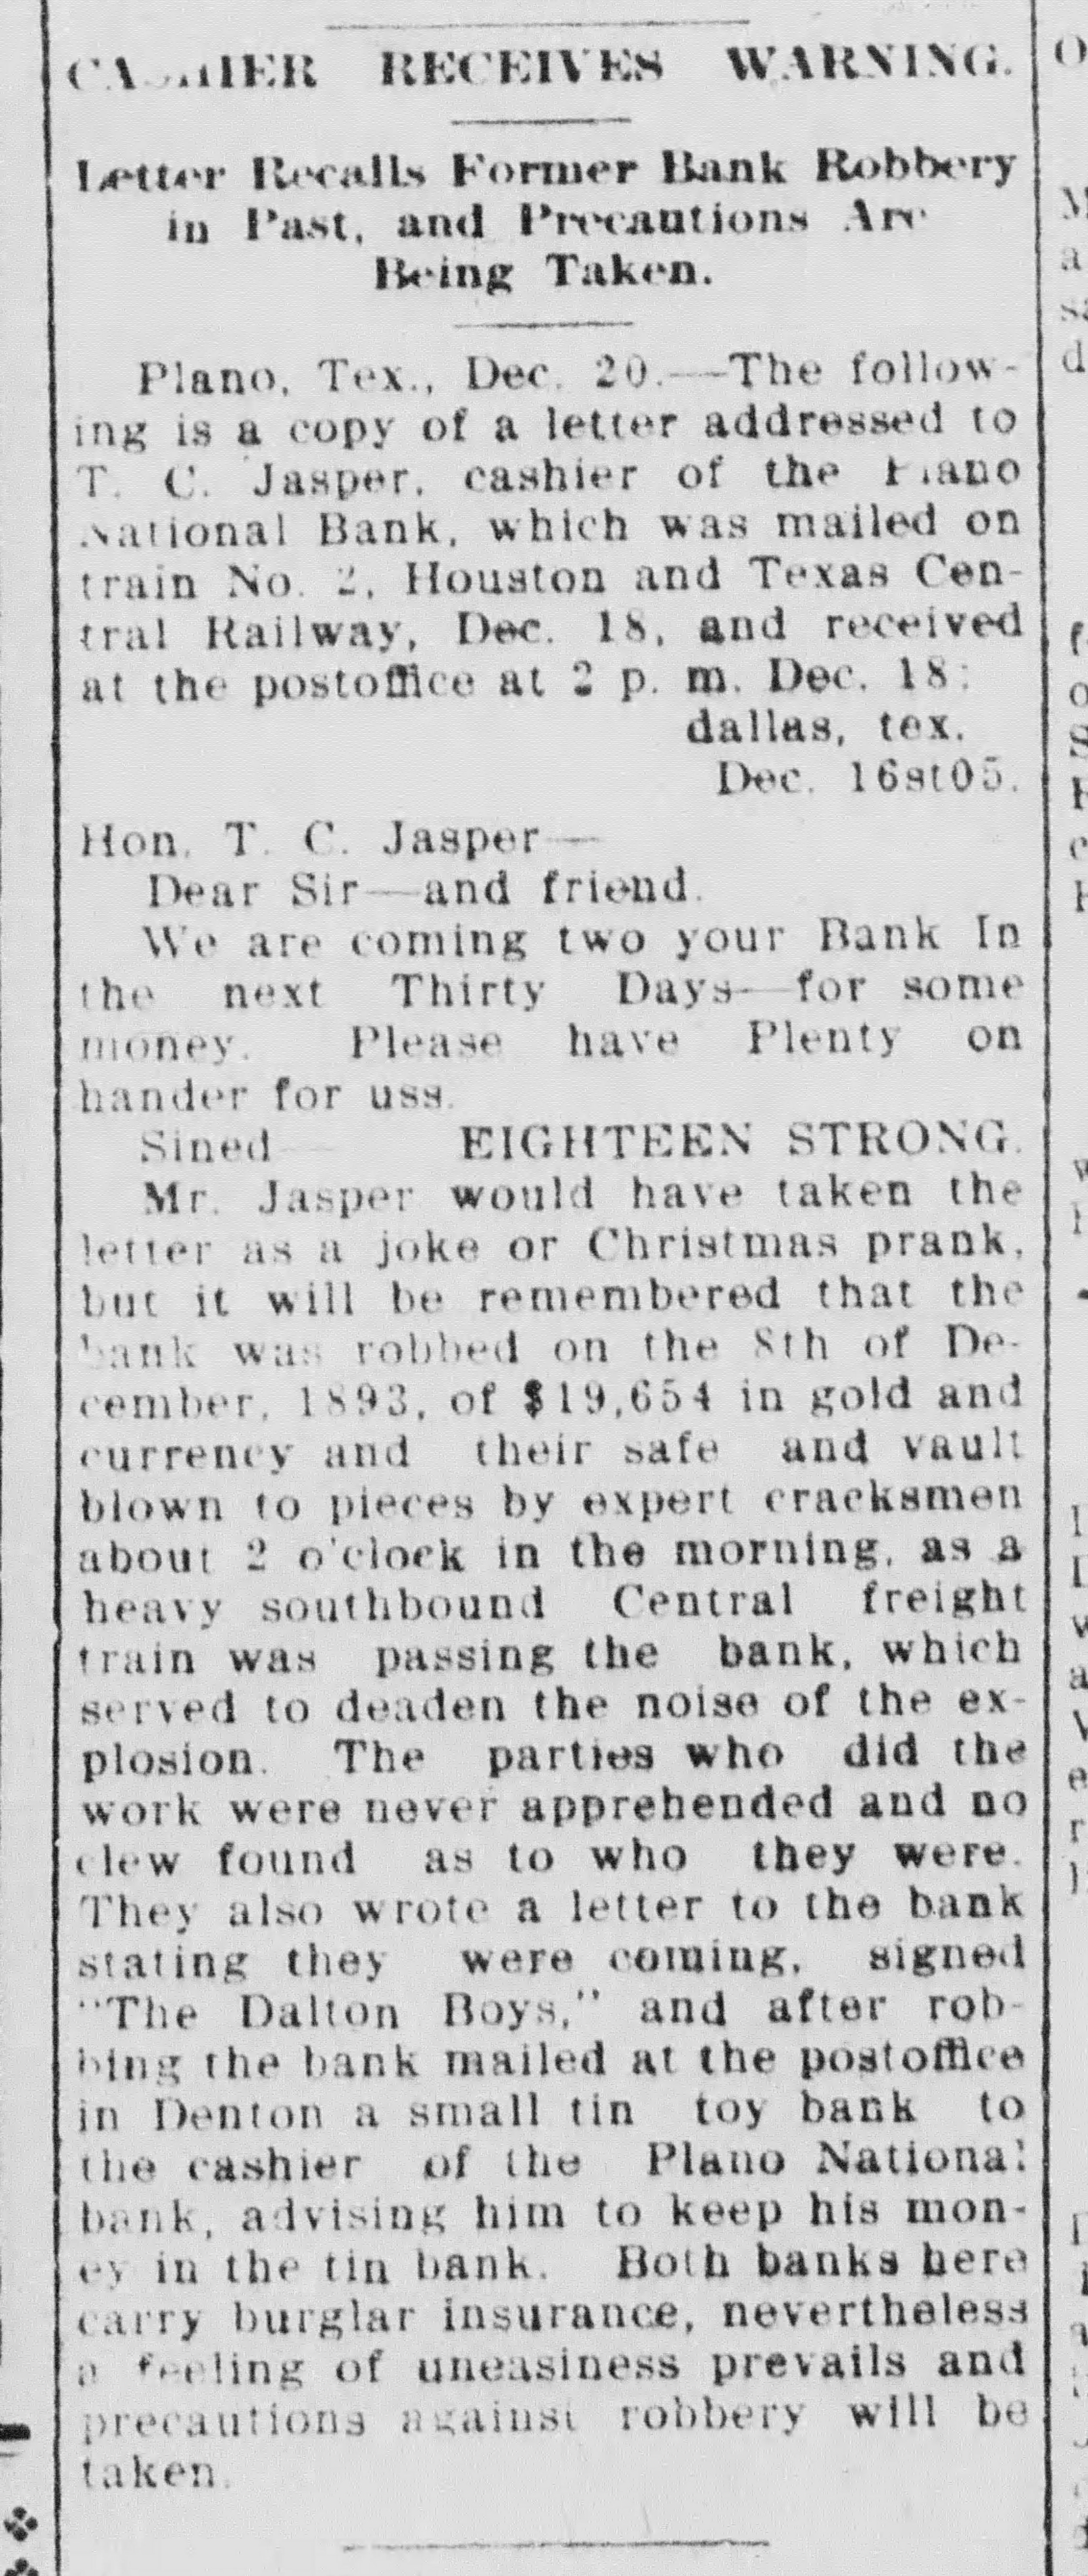 McKinney Dailey Courier, USA. Wednesday 20 December 1905.